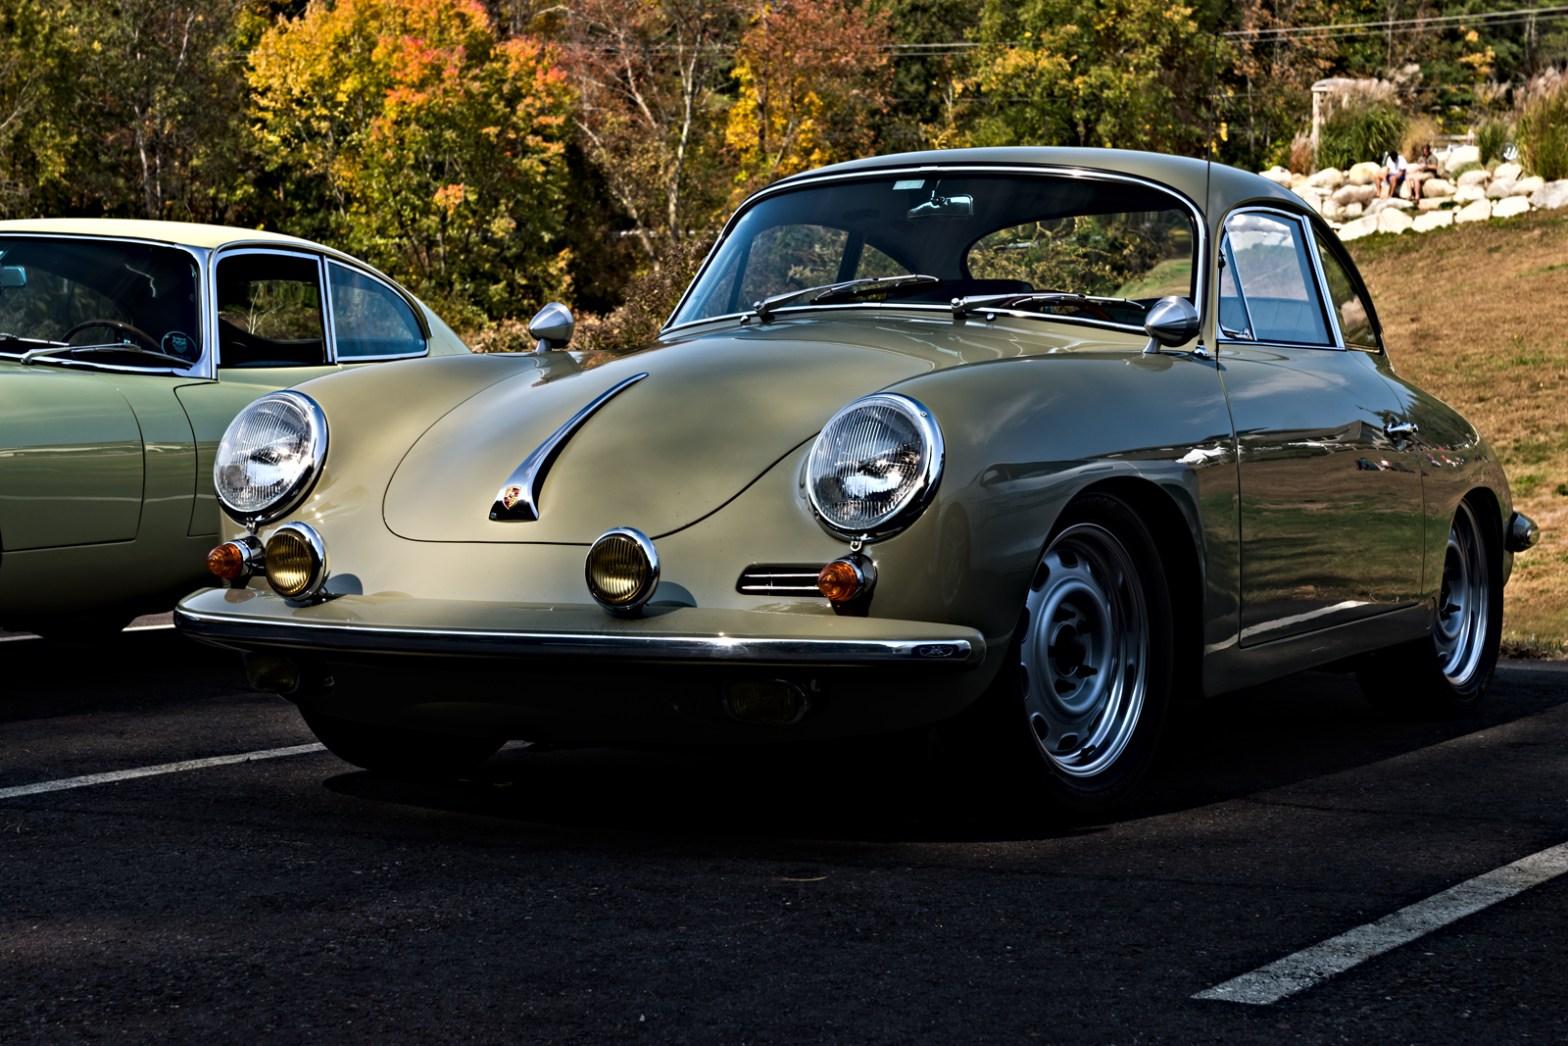 Porsche 356. Larz Anderson Auto Museum Fall 2020 Drive. Labelle Winery, NH